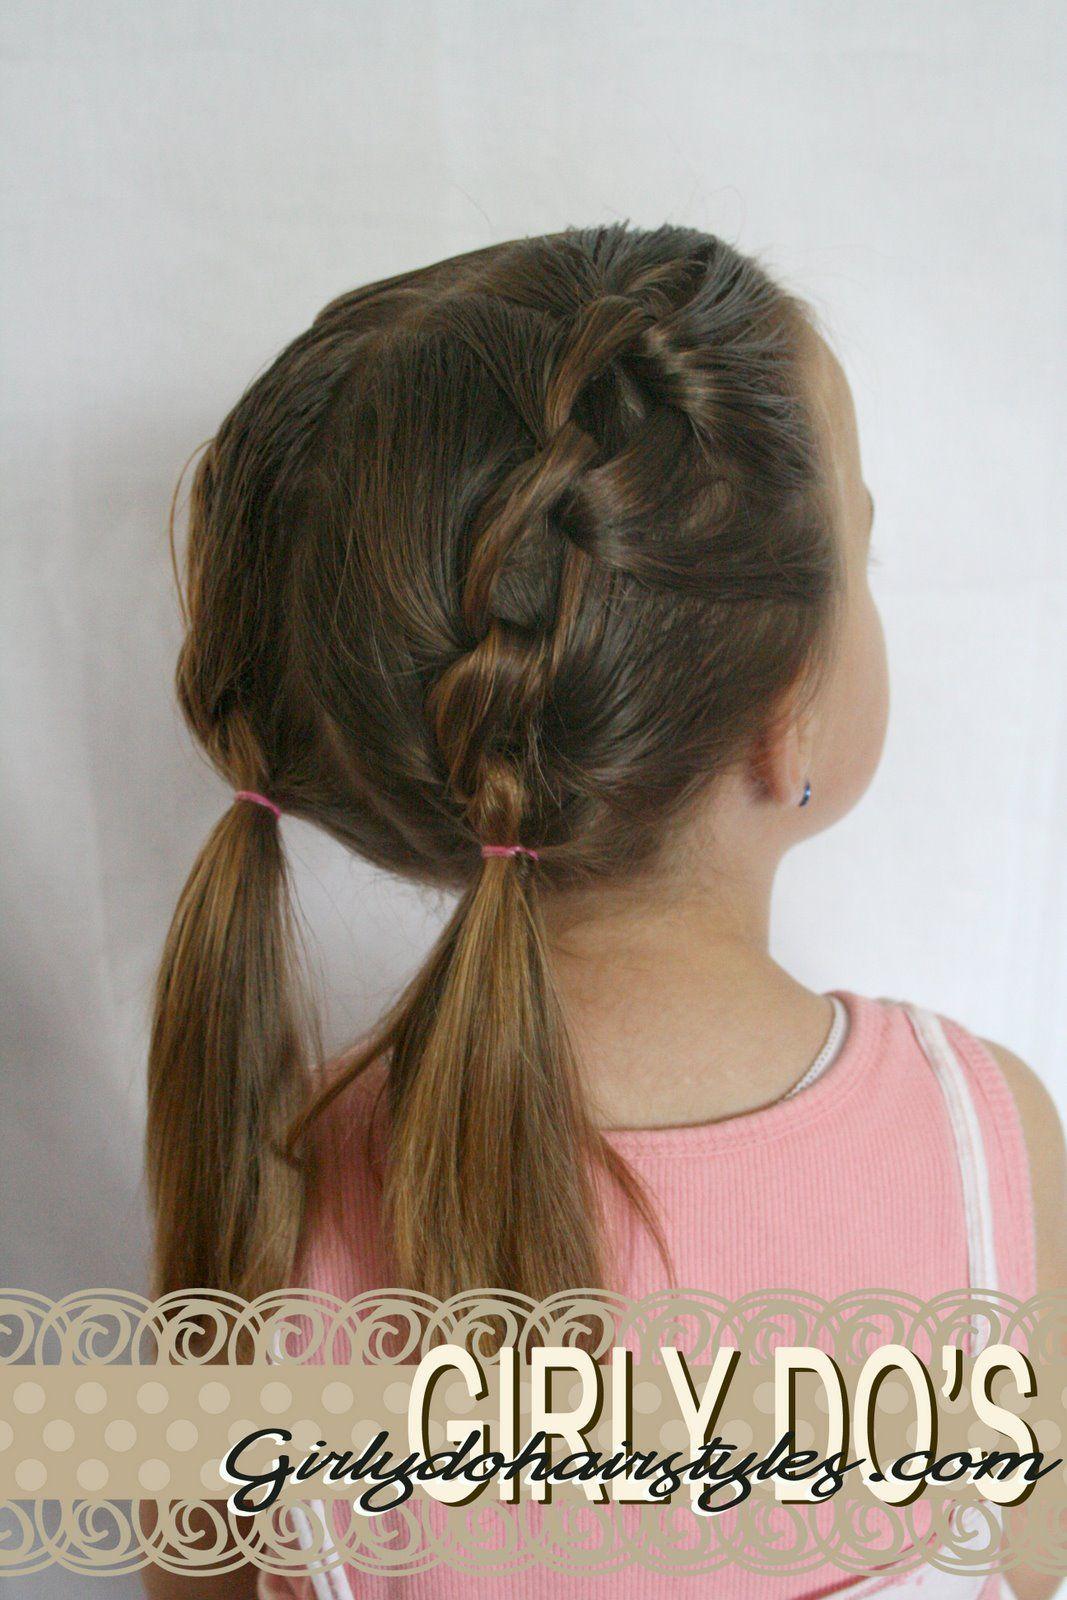 Toddler Hairstyles Gorgeous Girly Do Hairstylesjenn Linky Pigs  Girls Hair Tutorial